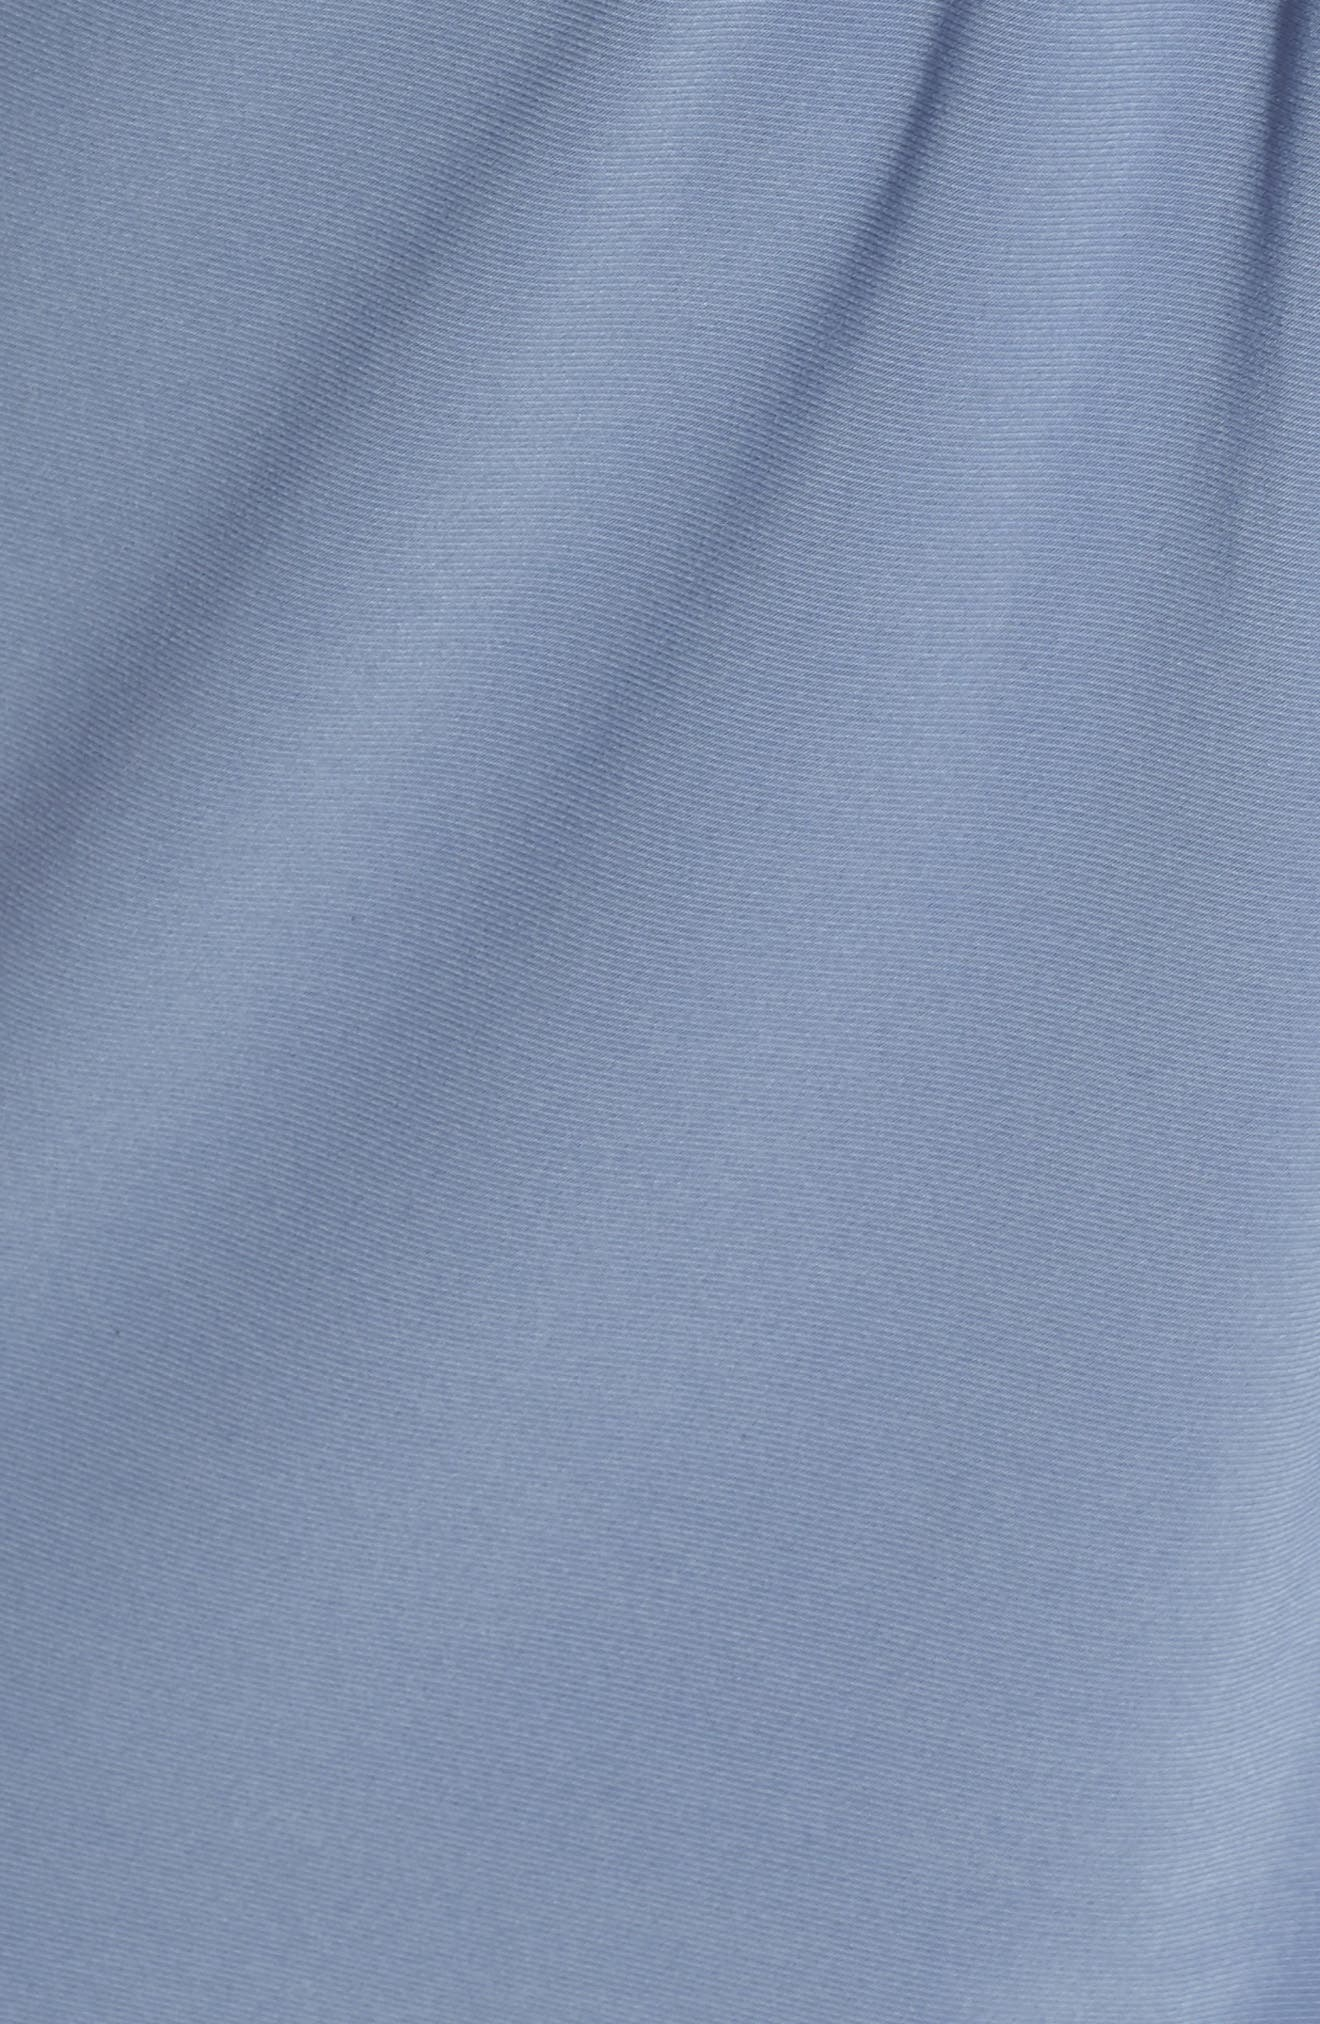 Knot Front Mixed Media Sheath Dress,                             Alternate thumbnail 6, color,                             451